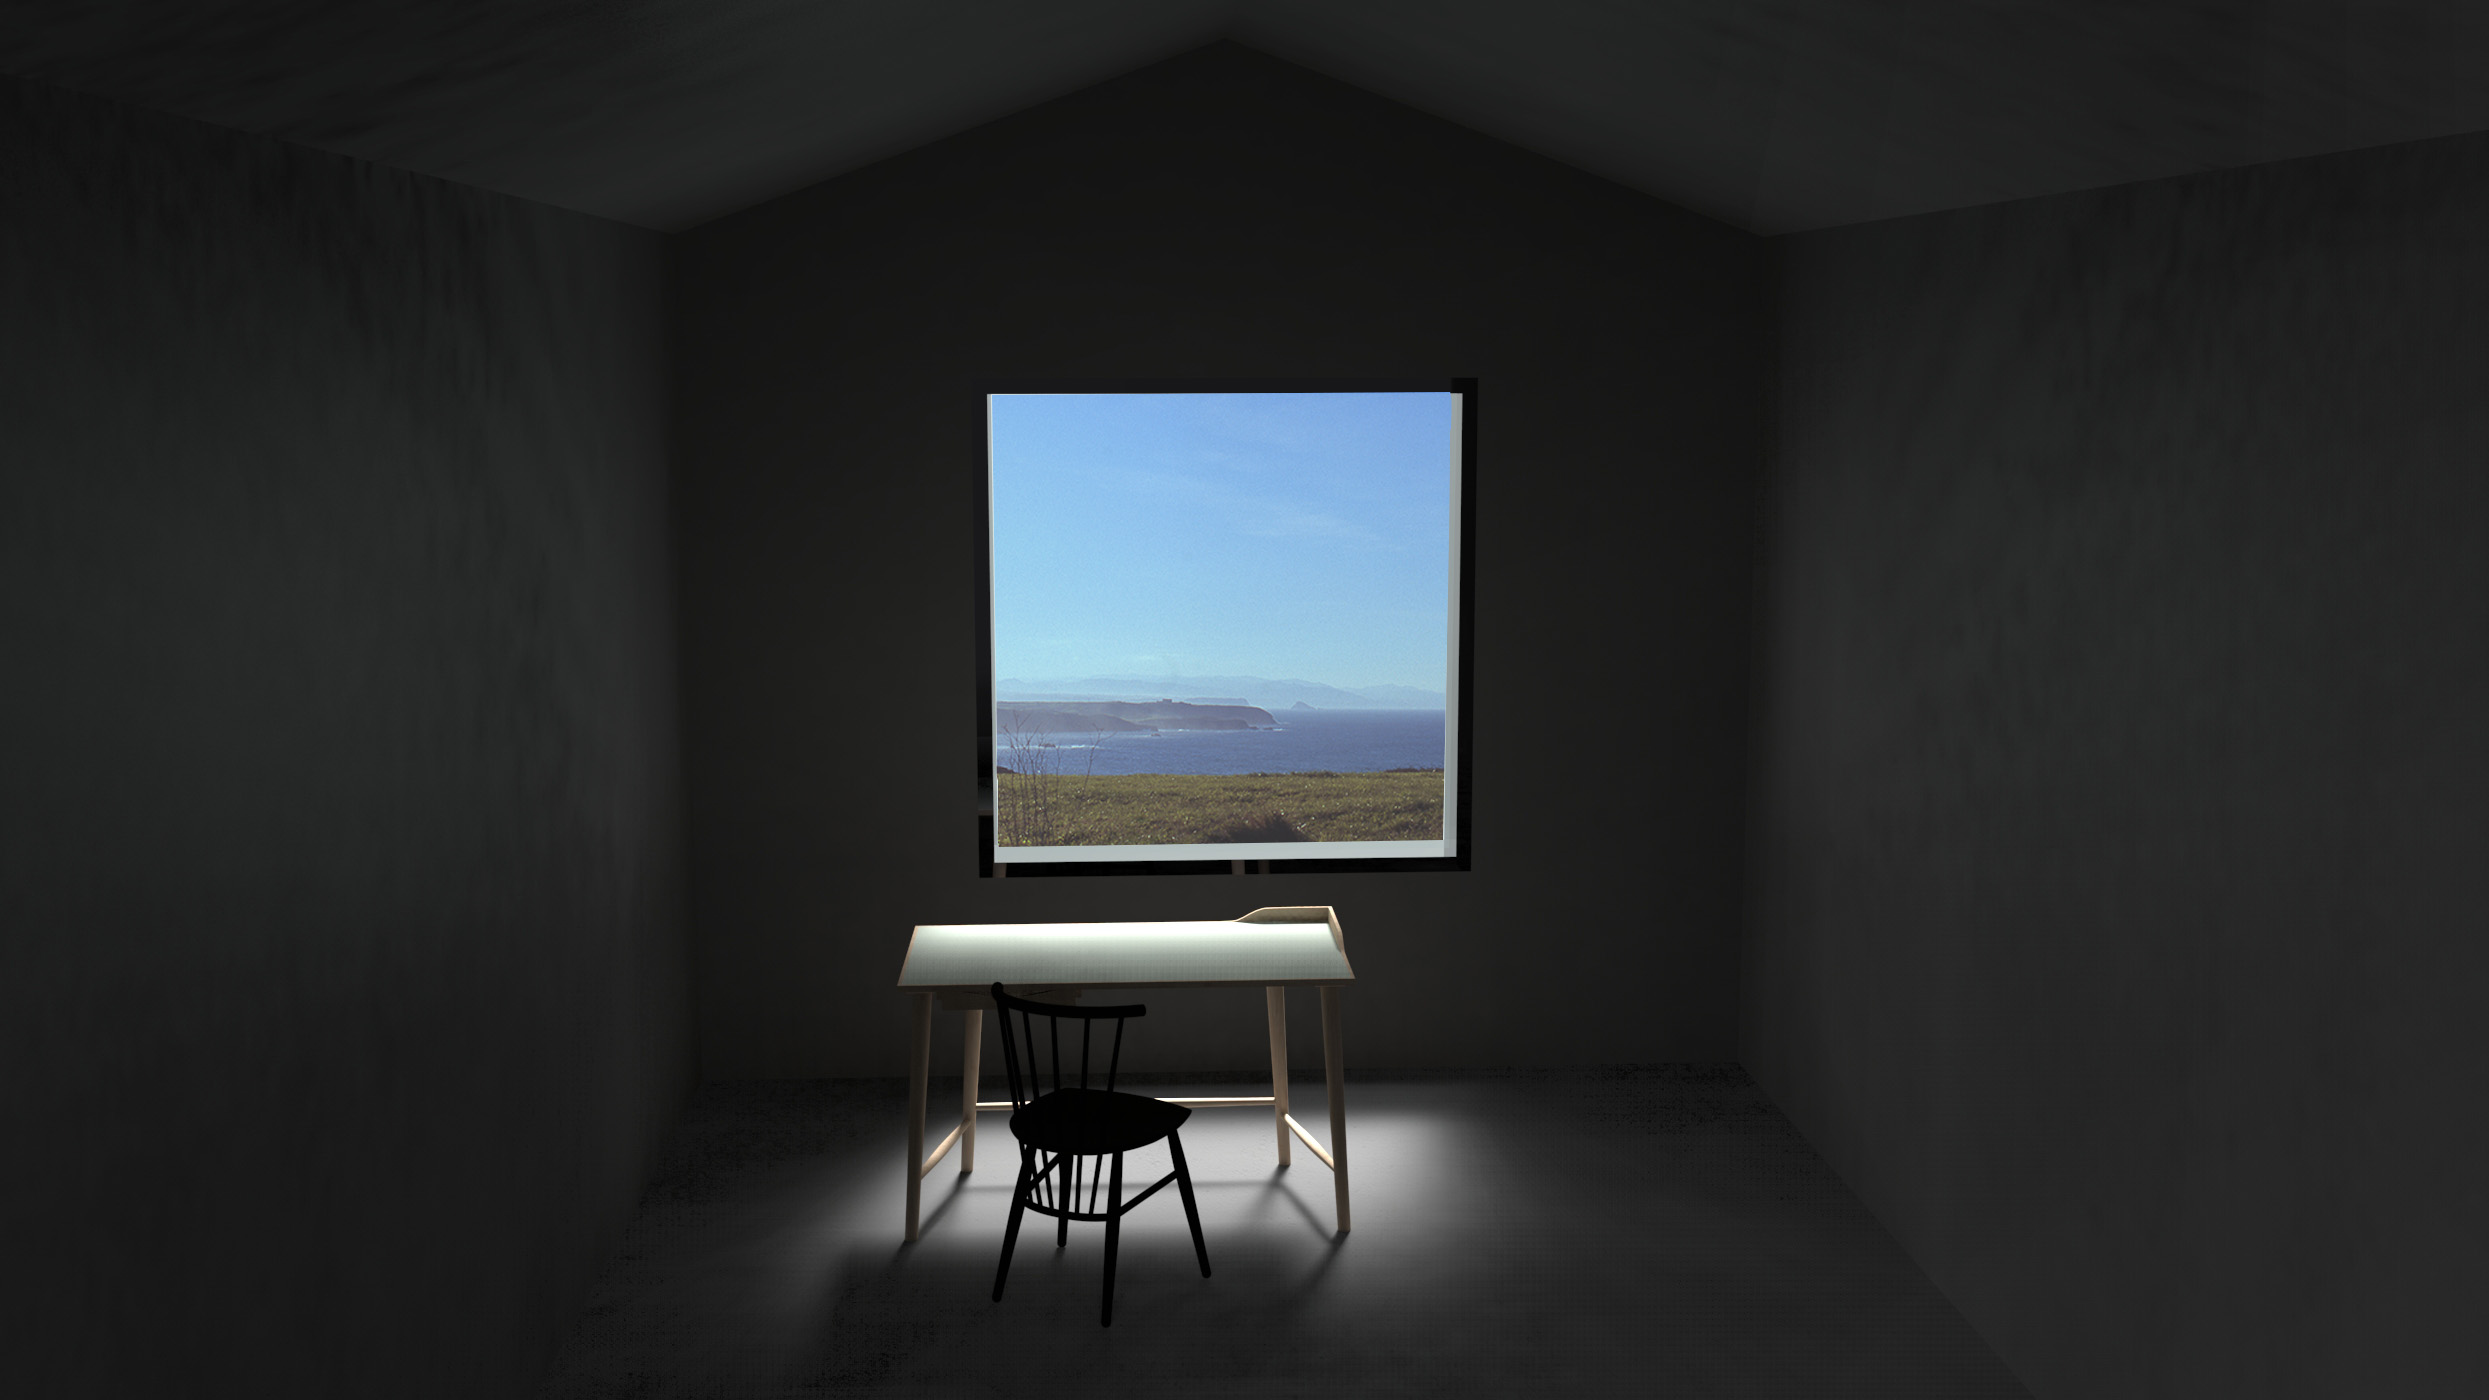 Loenstrup_desk (4).jpg